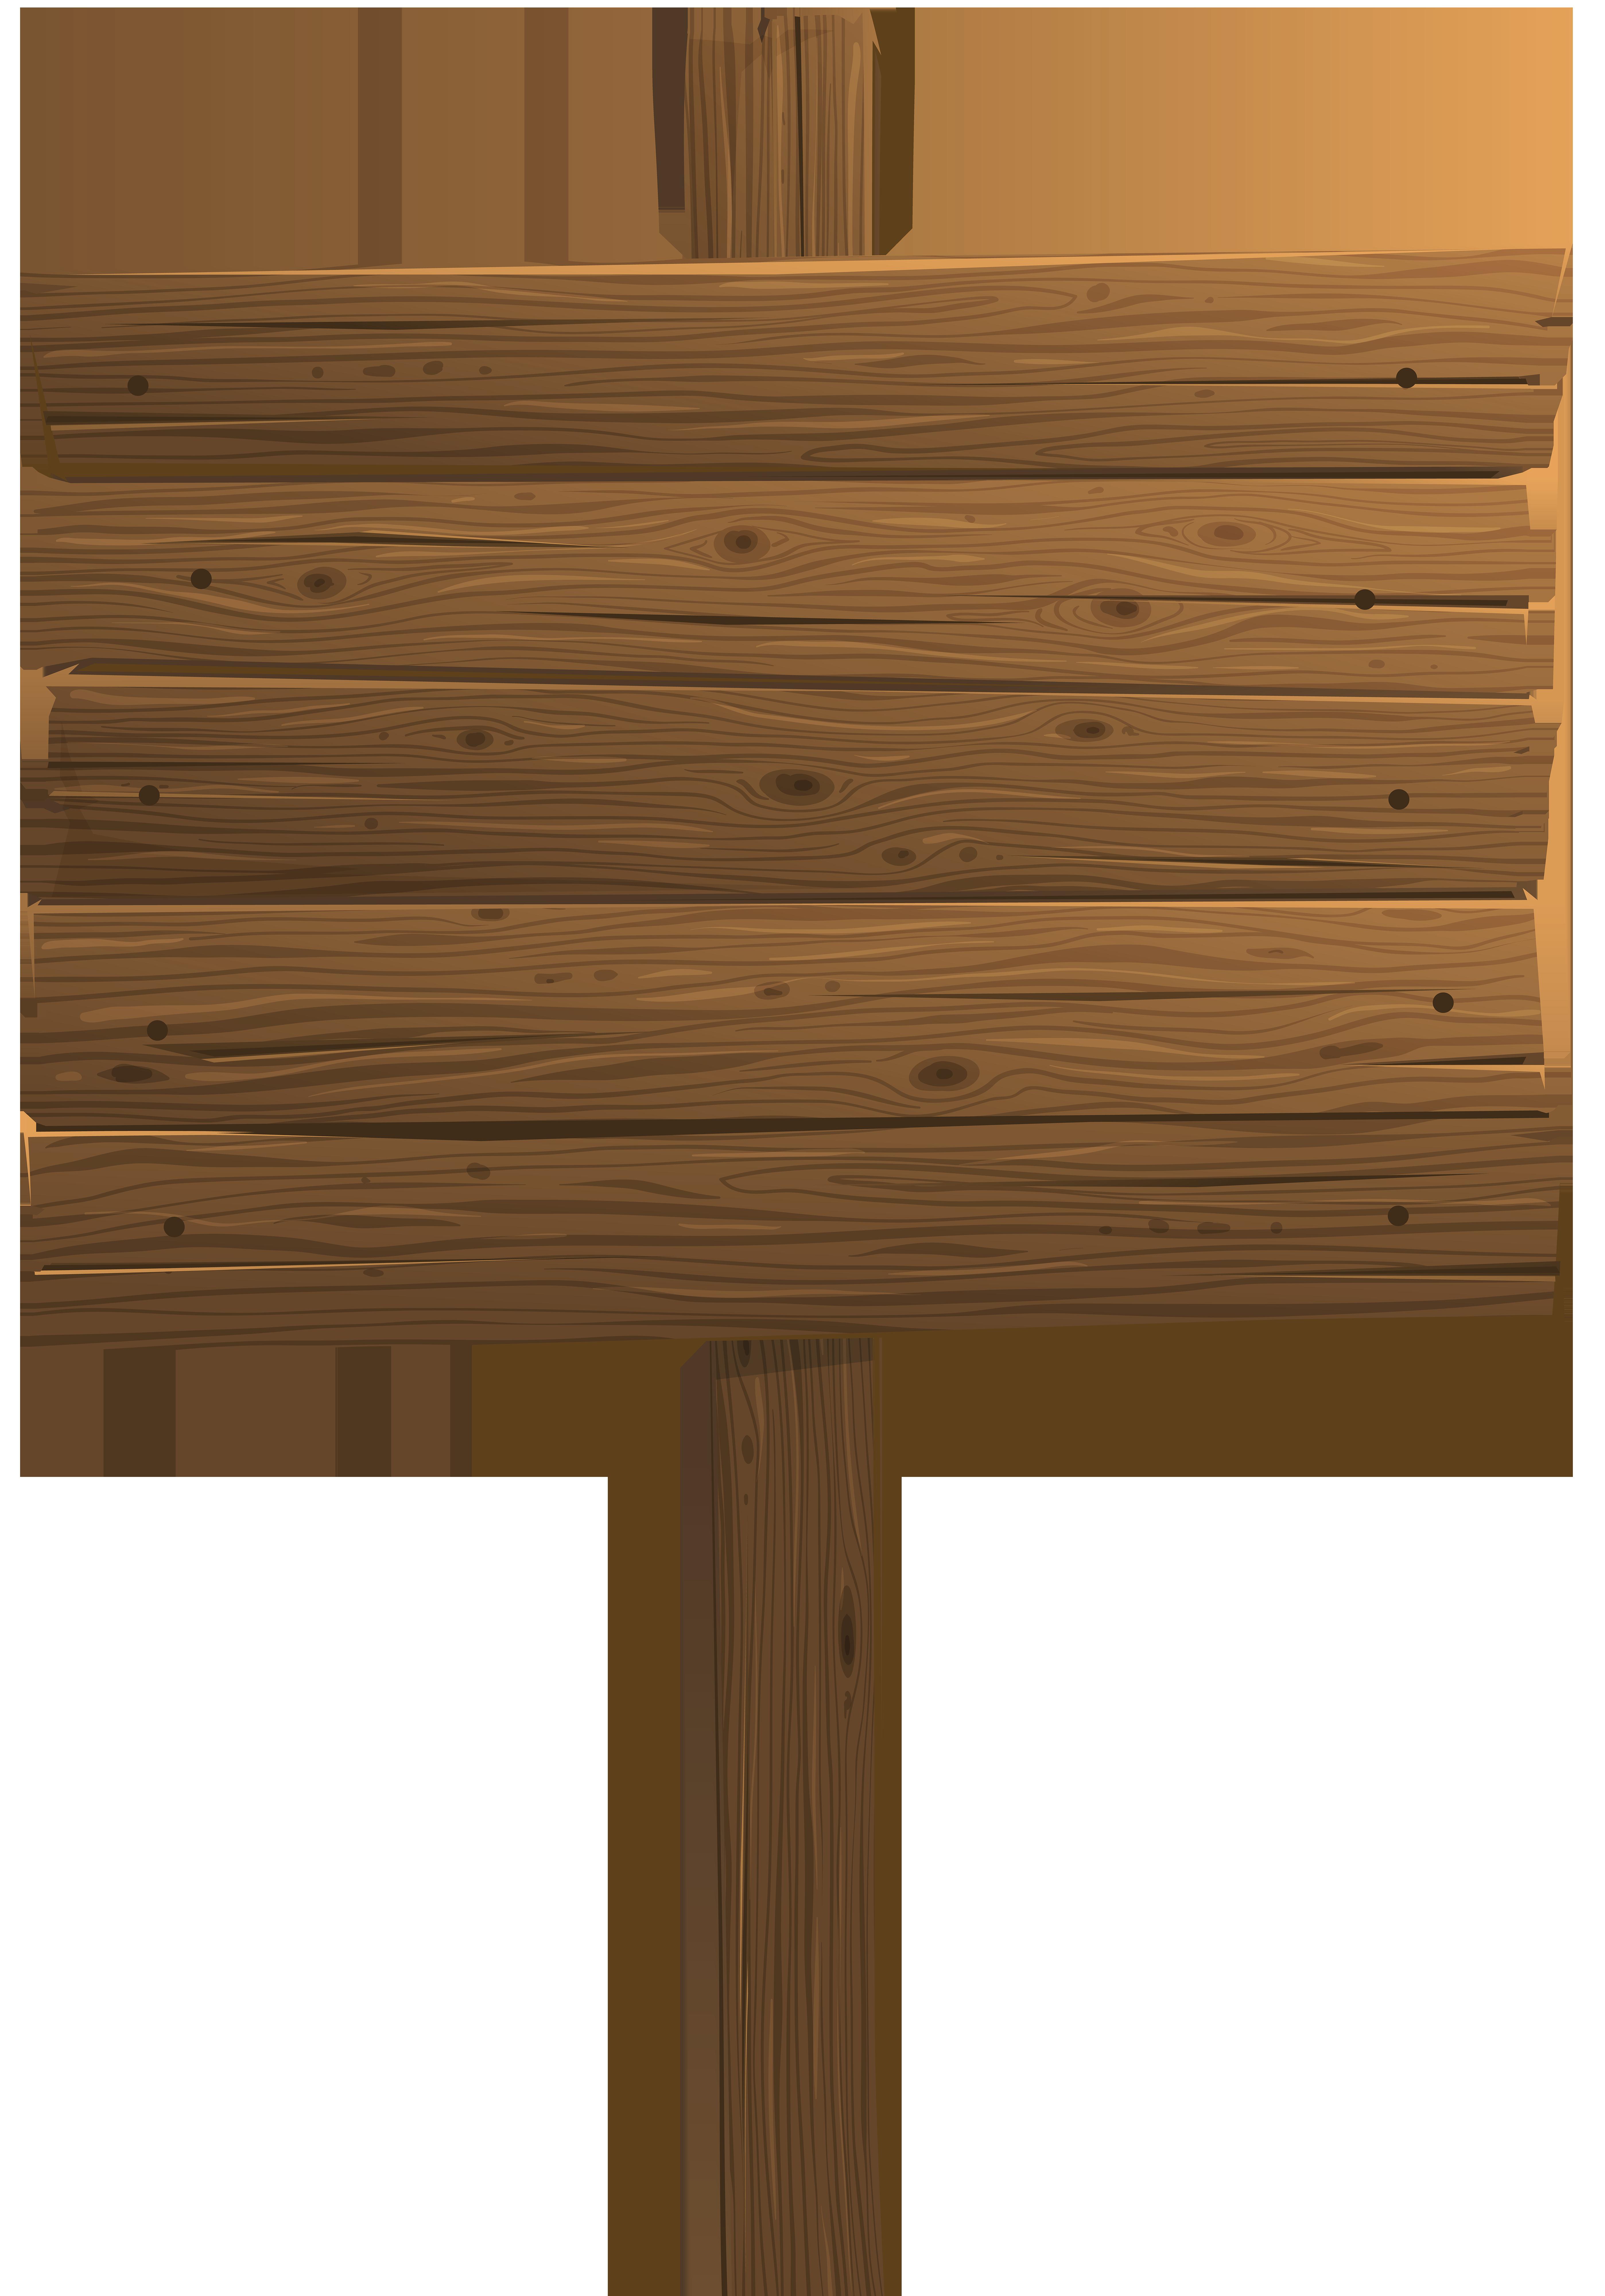 Wooden Sign PNG Clip Art Transparent Image.